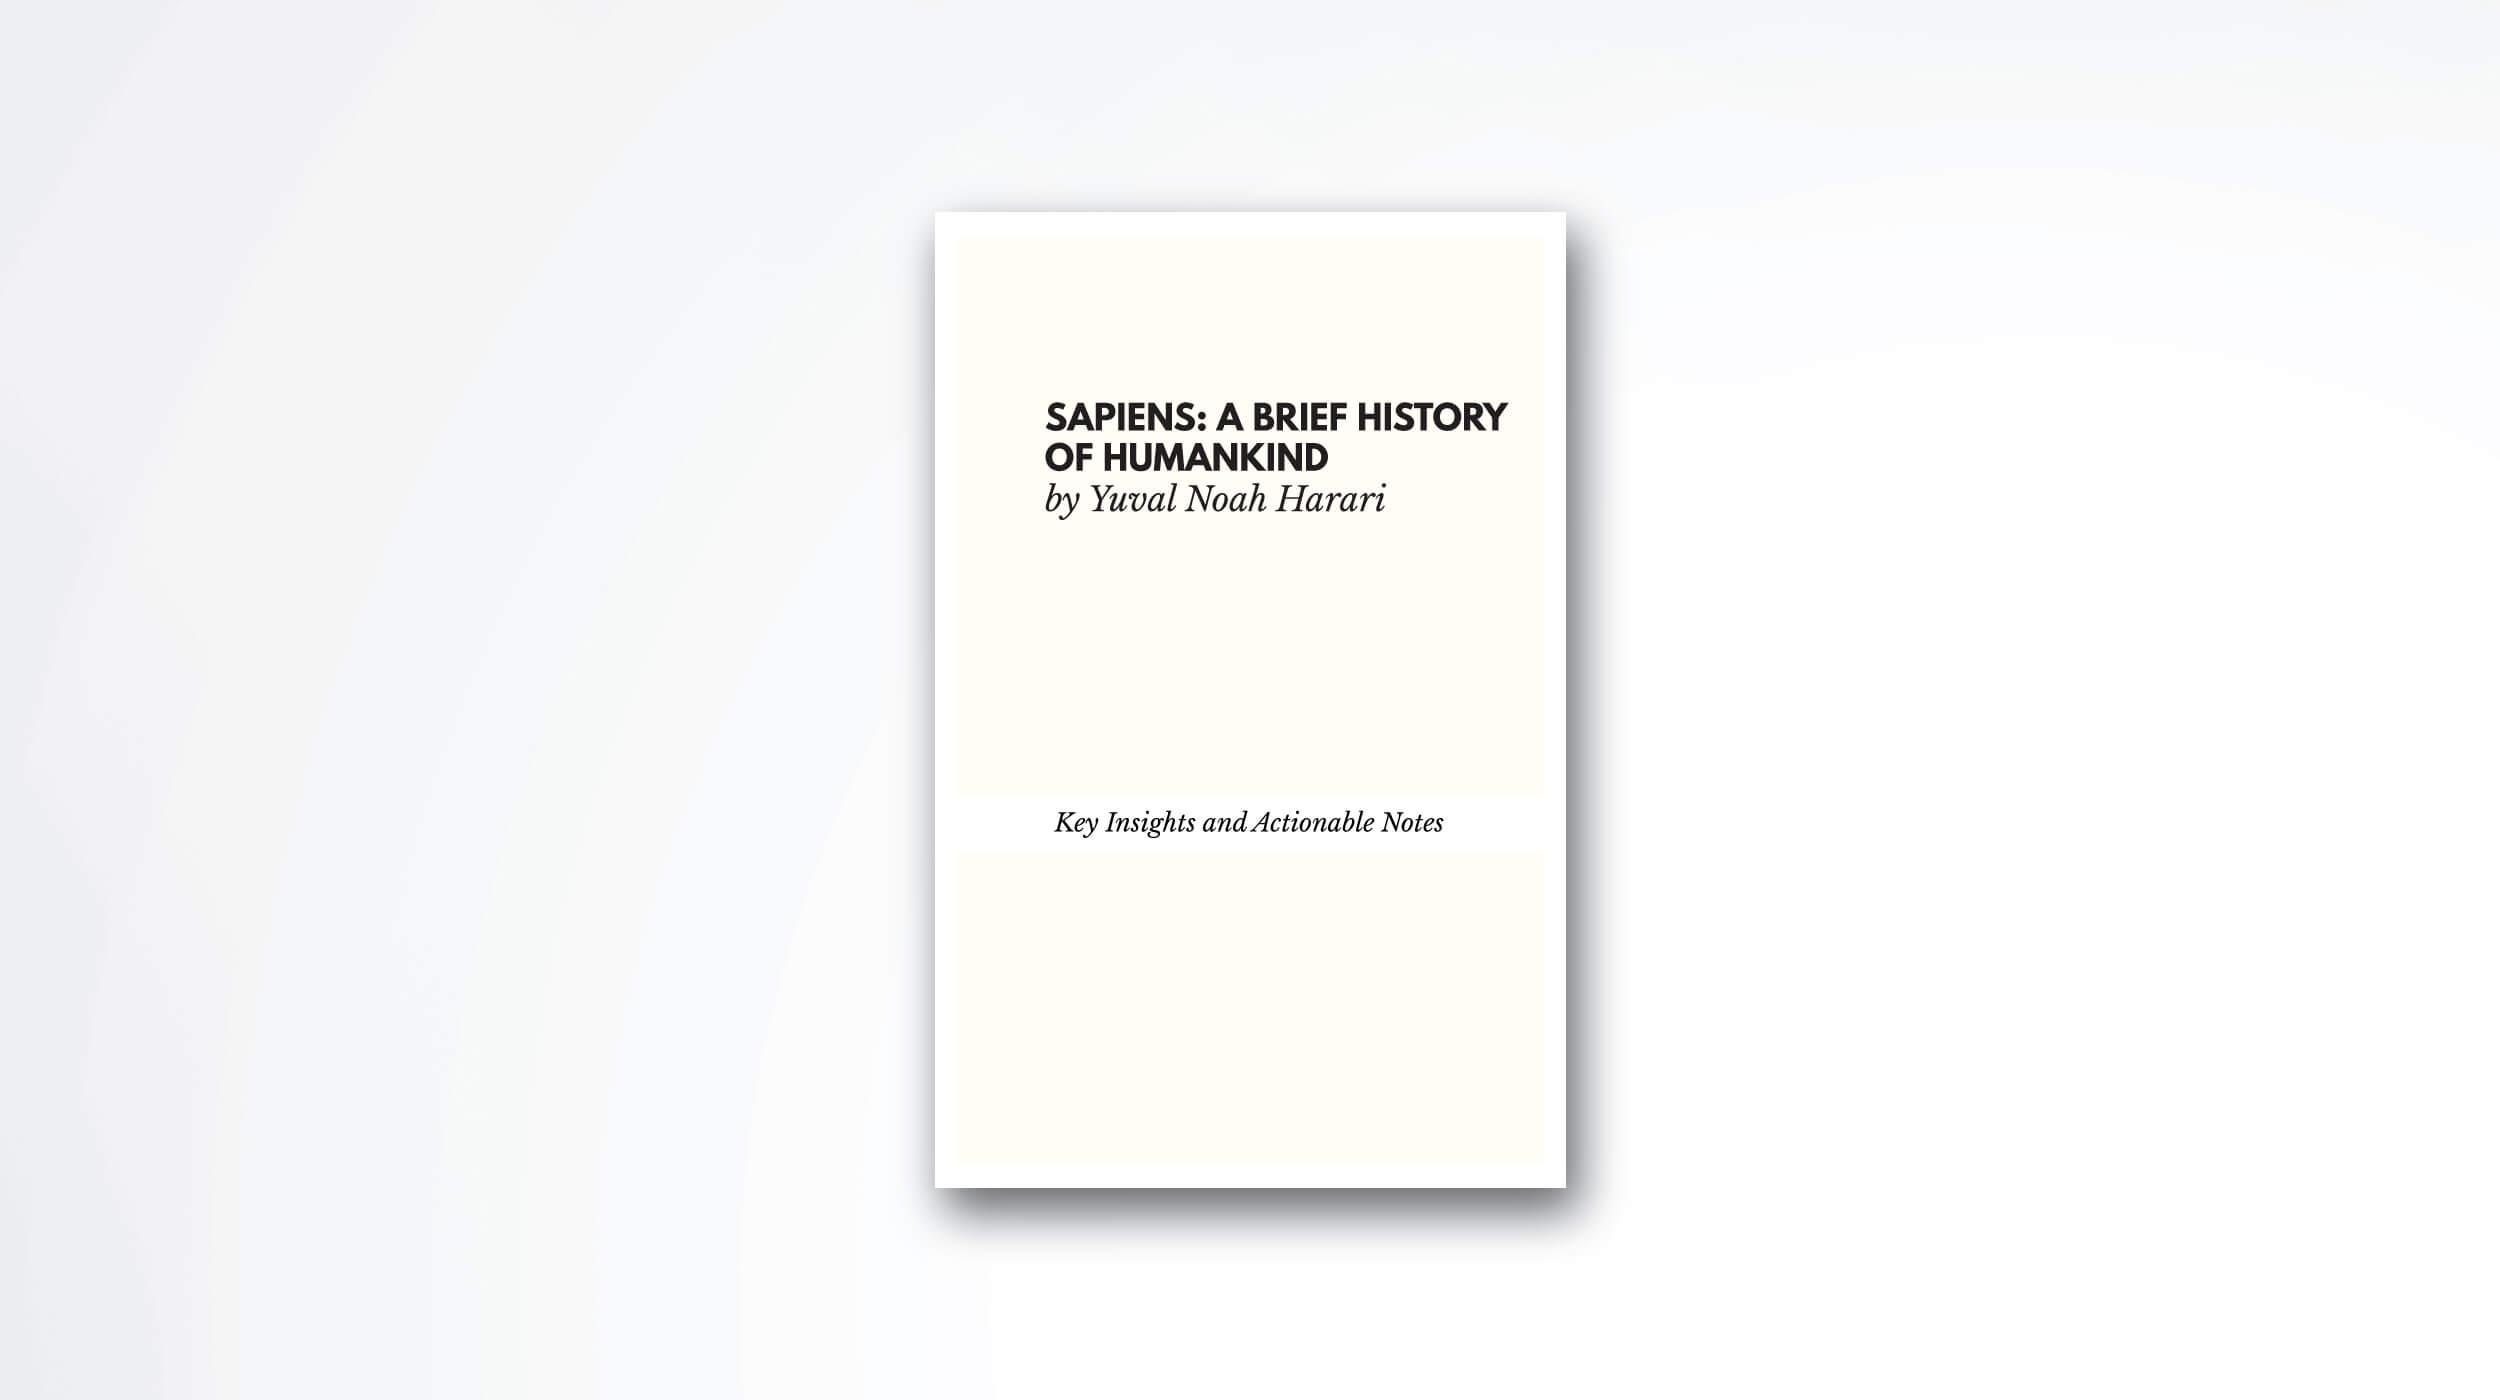 Sapiens by Yuval Noah Harari [Summary] | Durmonski.com